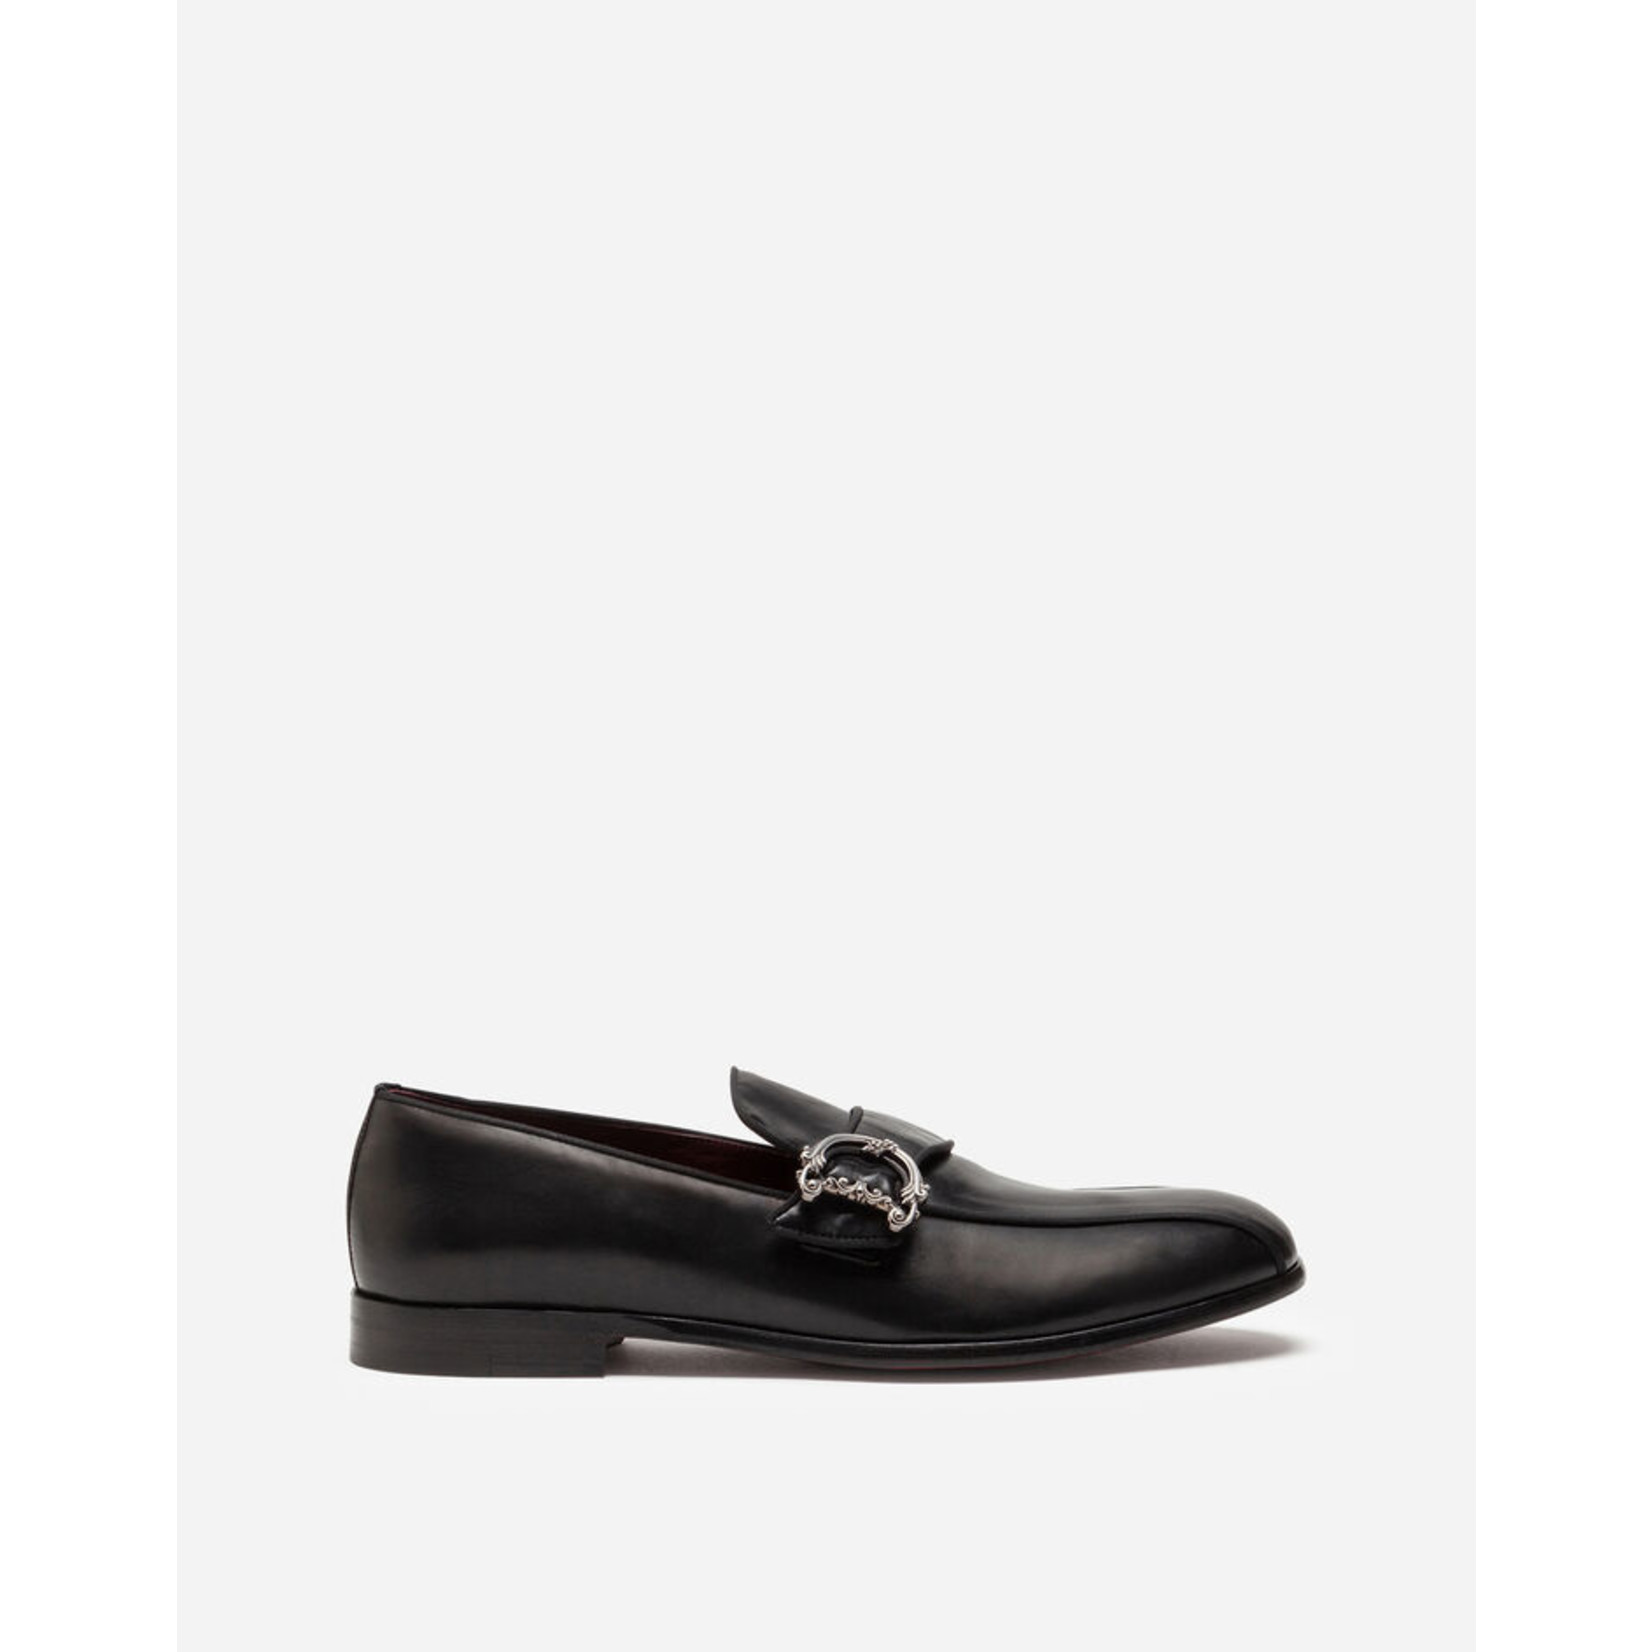 Dolce&Gabbana schoenen Schoenen 42718